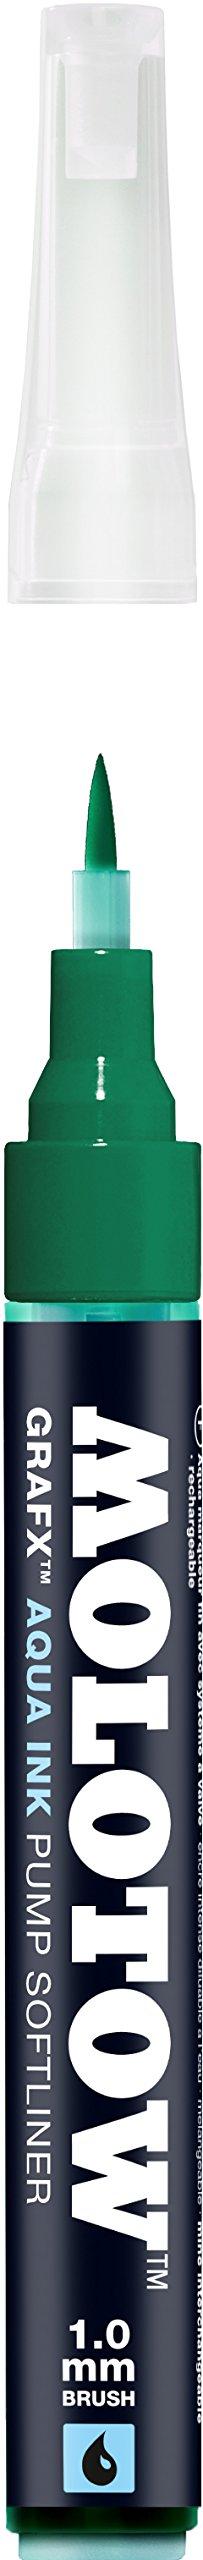 Molotow GRAFX Aqua Ink Soft Liner Brush Pump Marker, Dark...